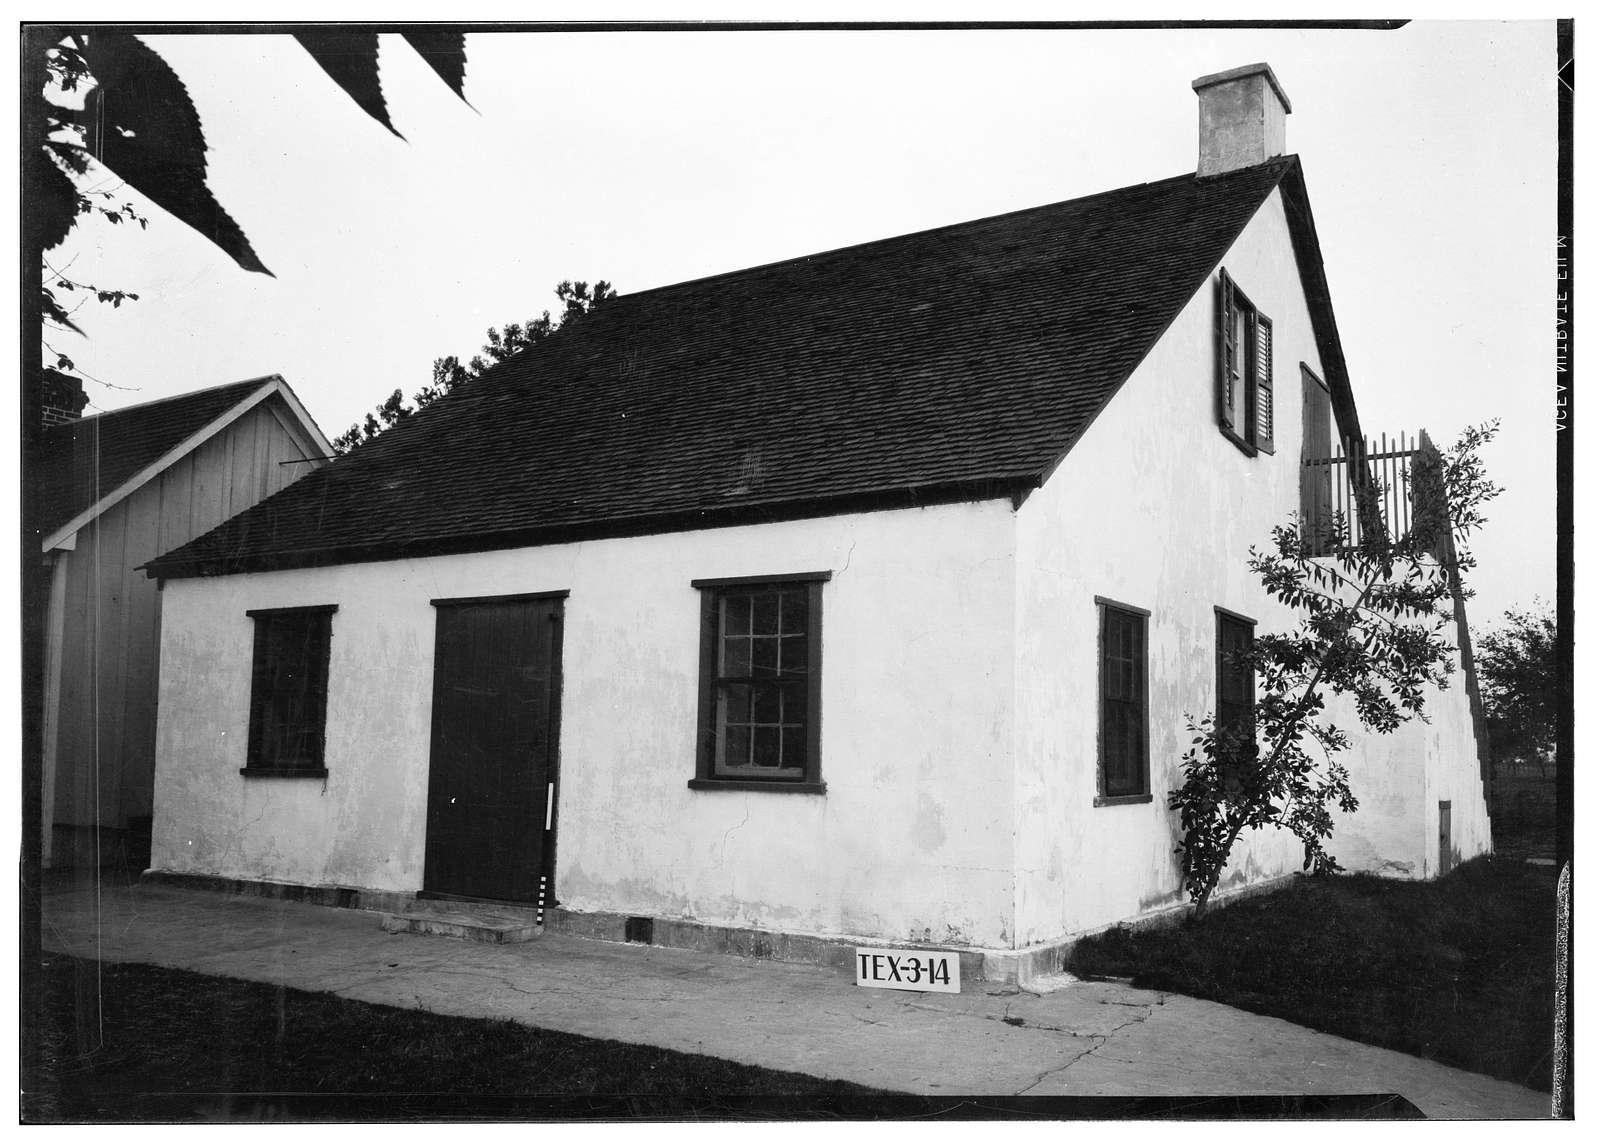 Machie Pawelek House, Texas 123 at Farm Road 887, Cestohowa, Karnes County, TX